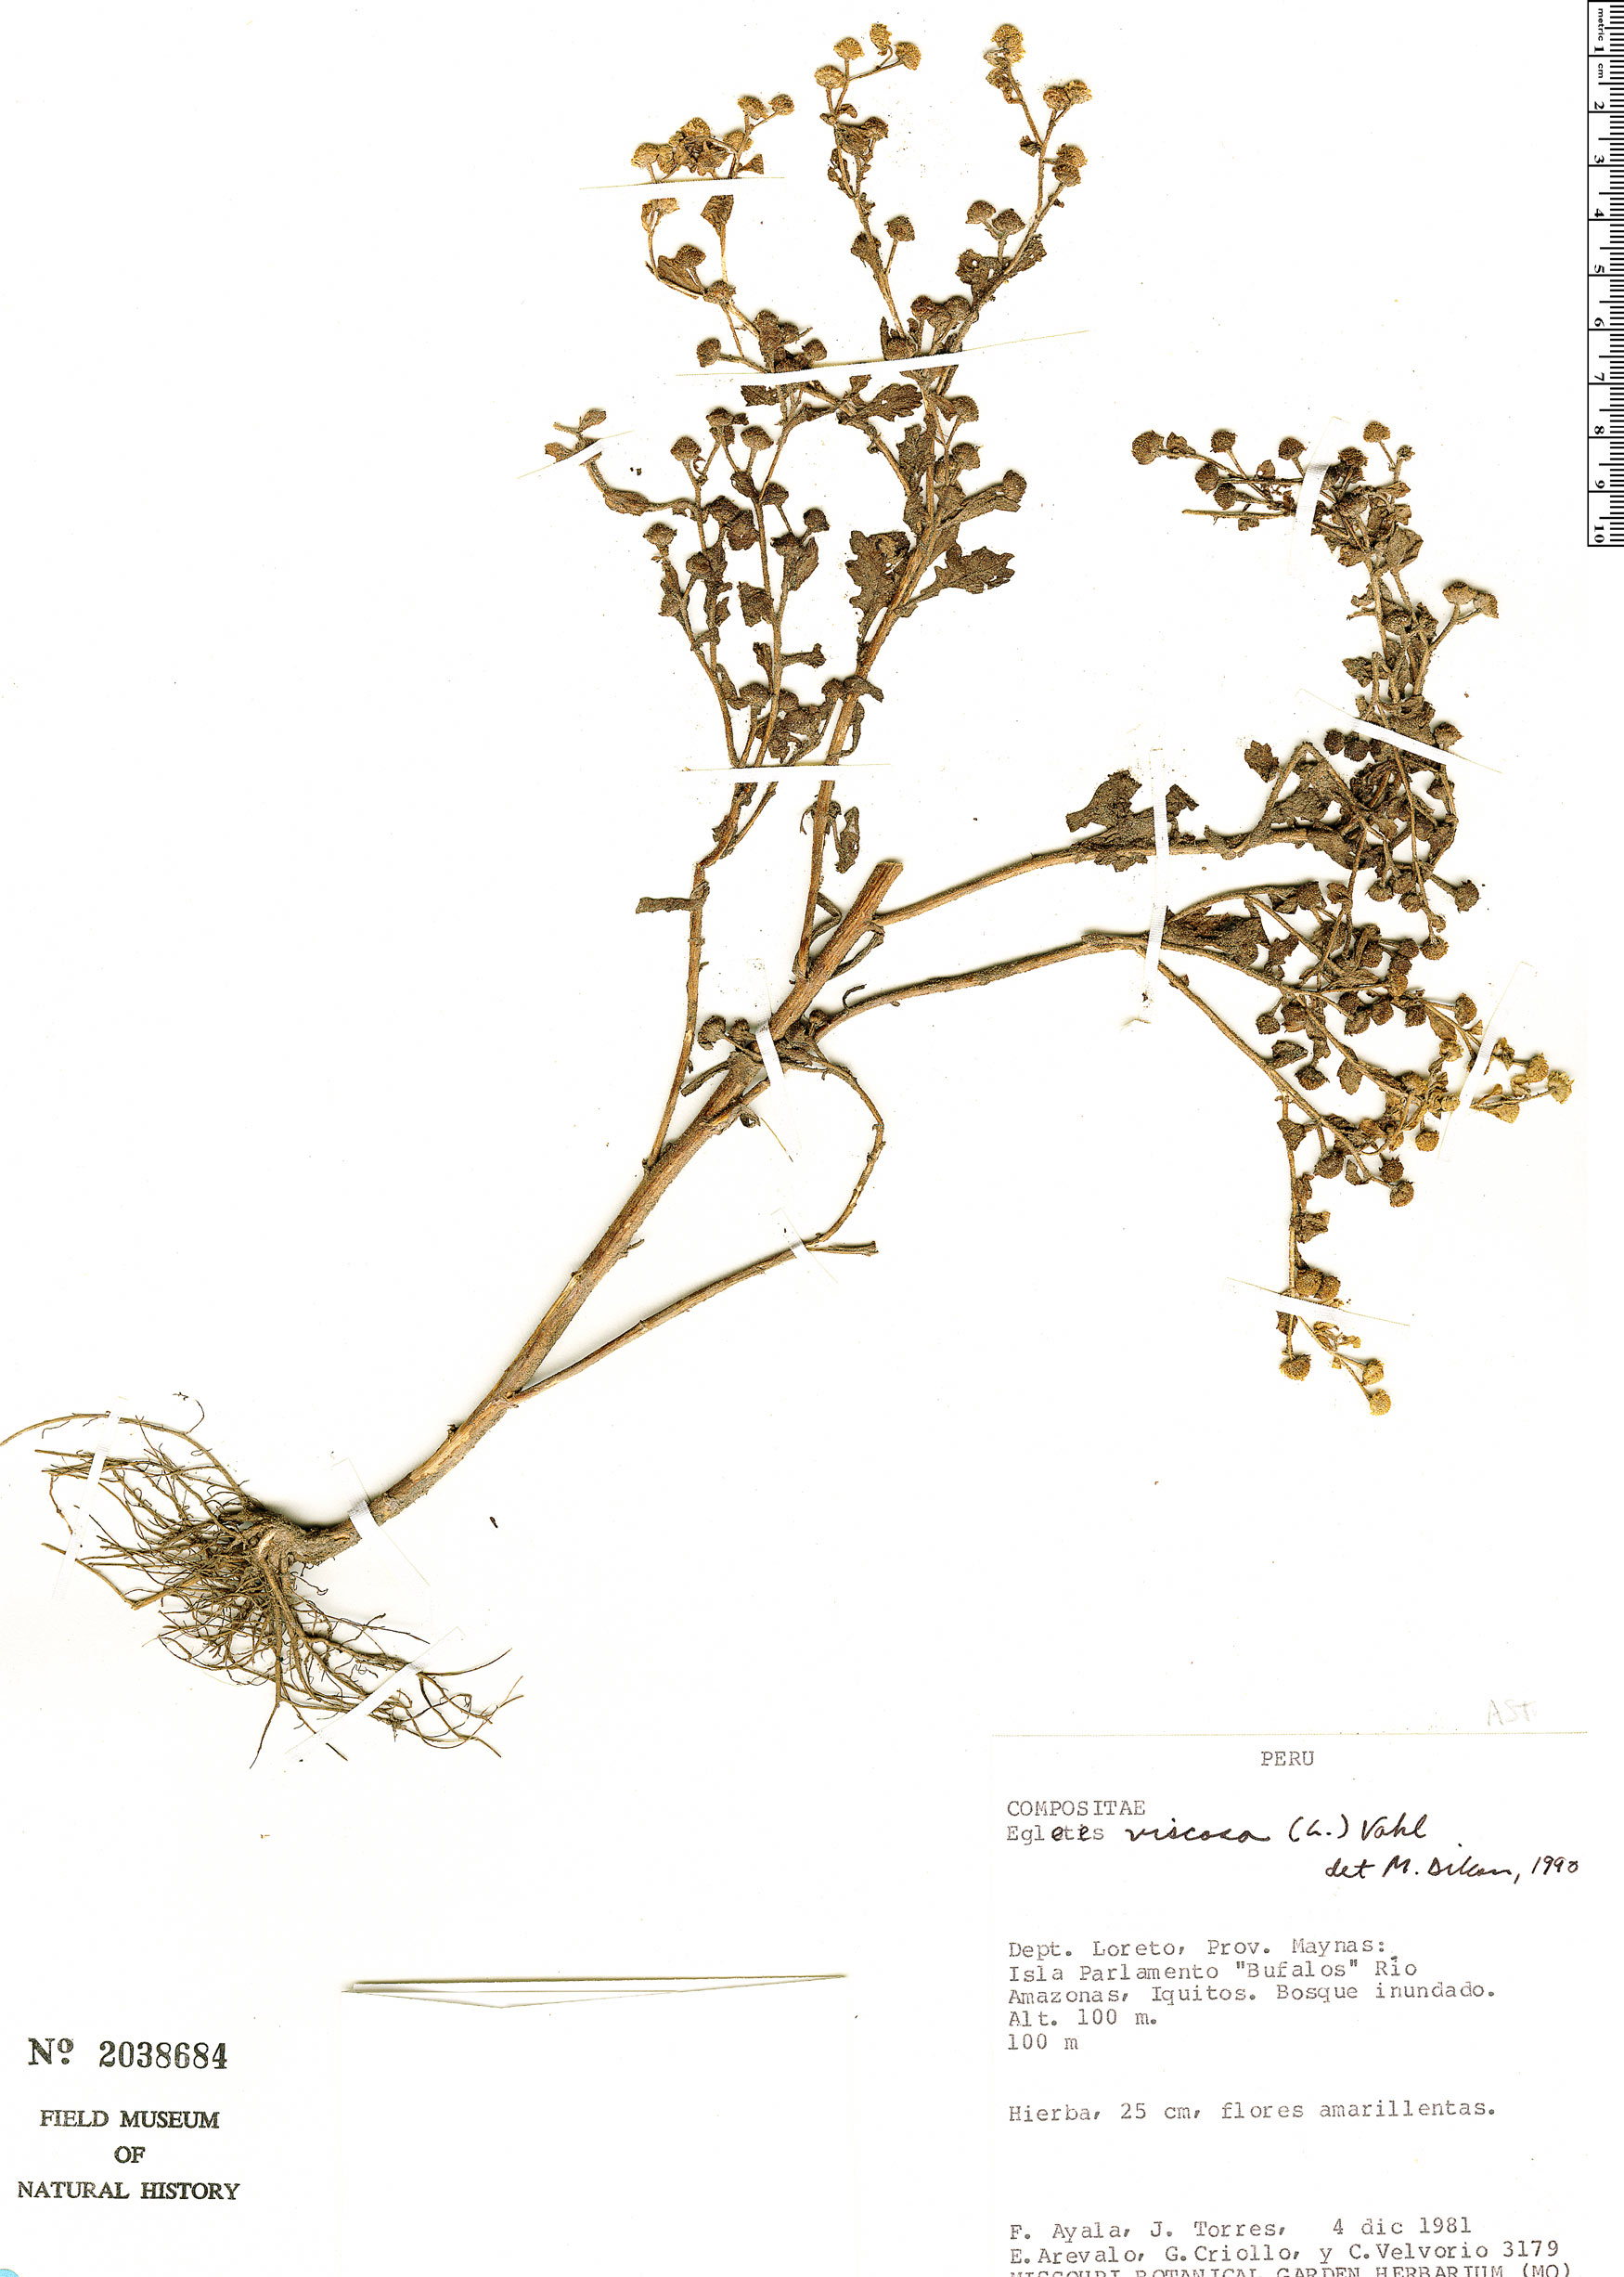 Specimen: Egletes viscosa